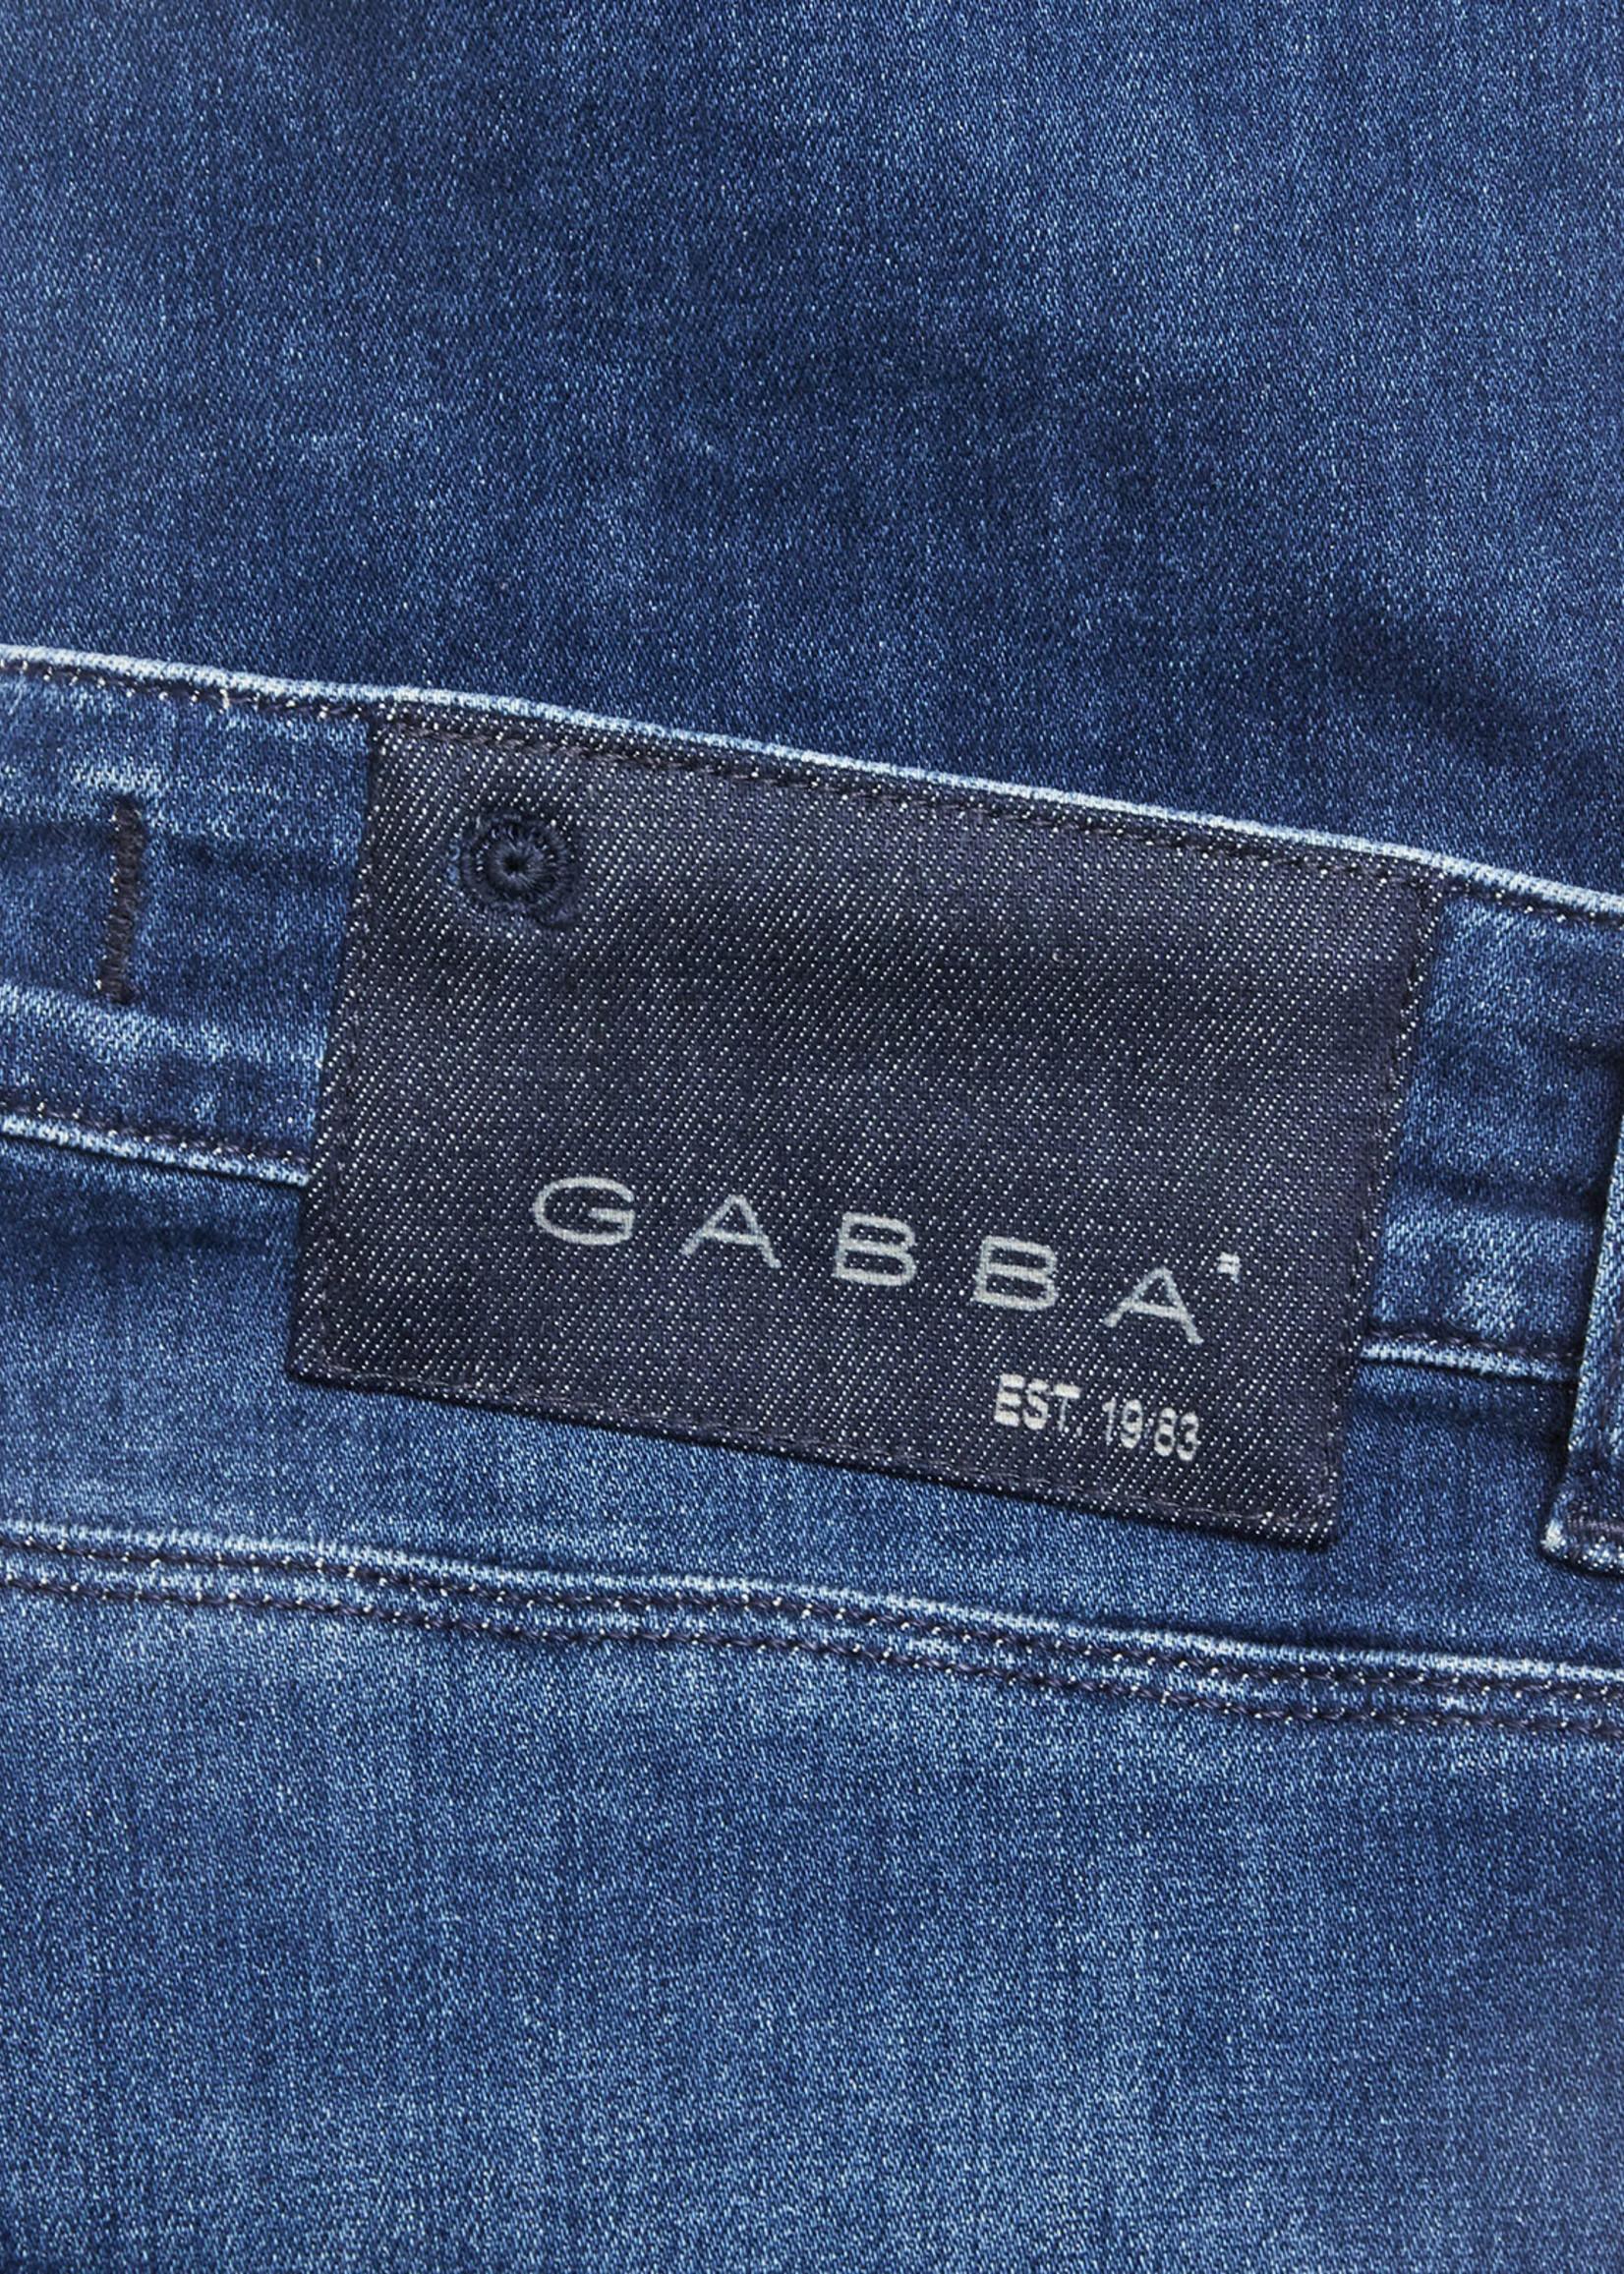 Gabba Rey K3886 Jeans